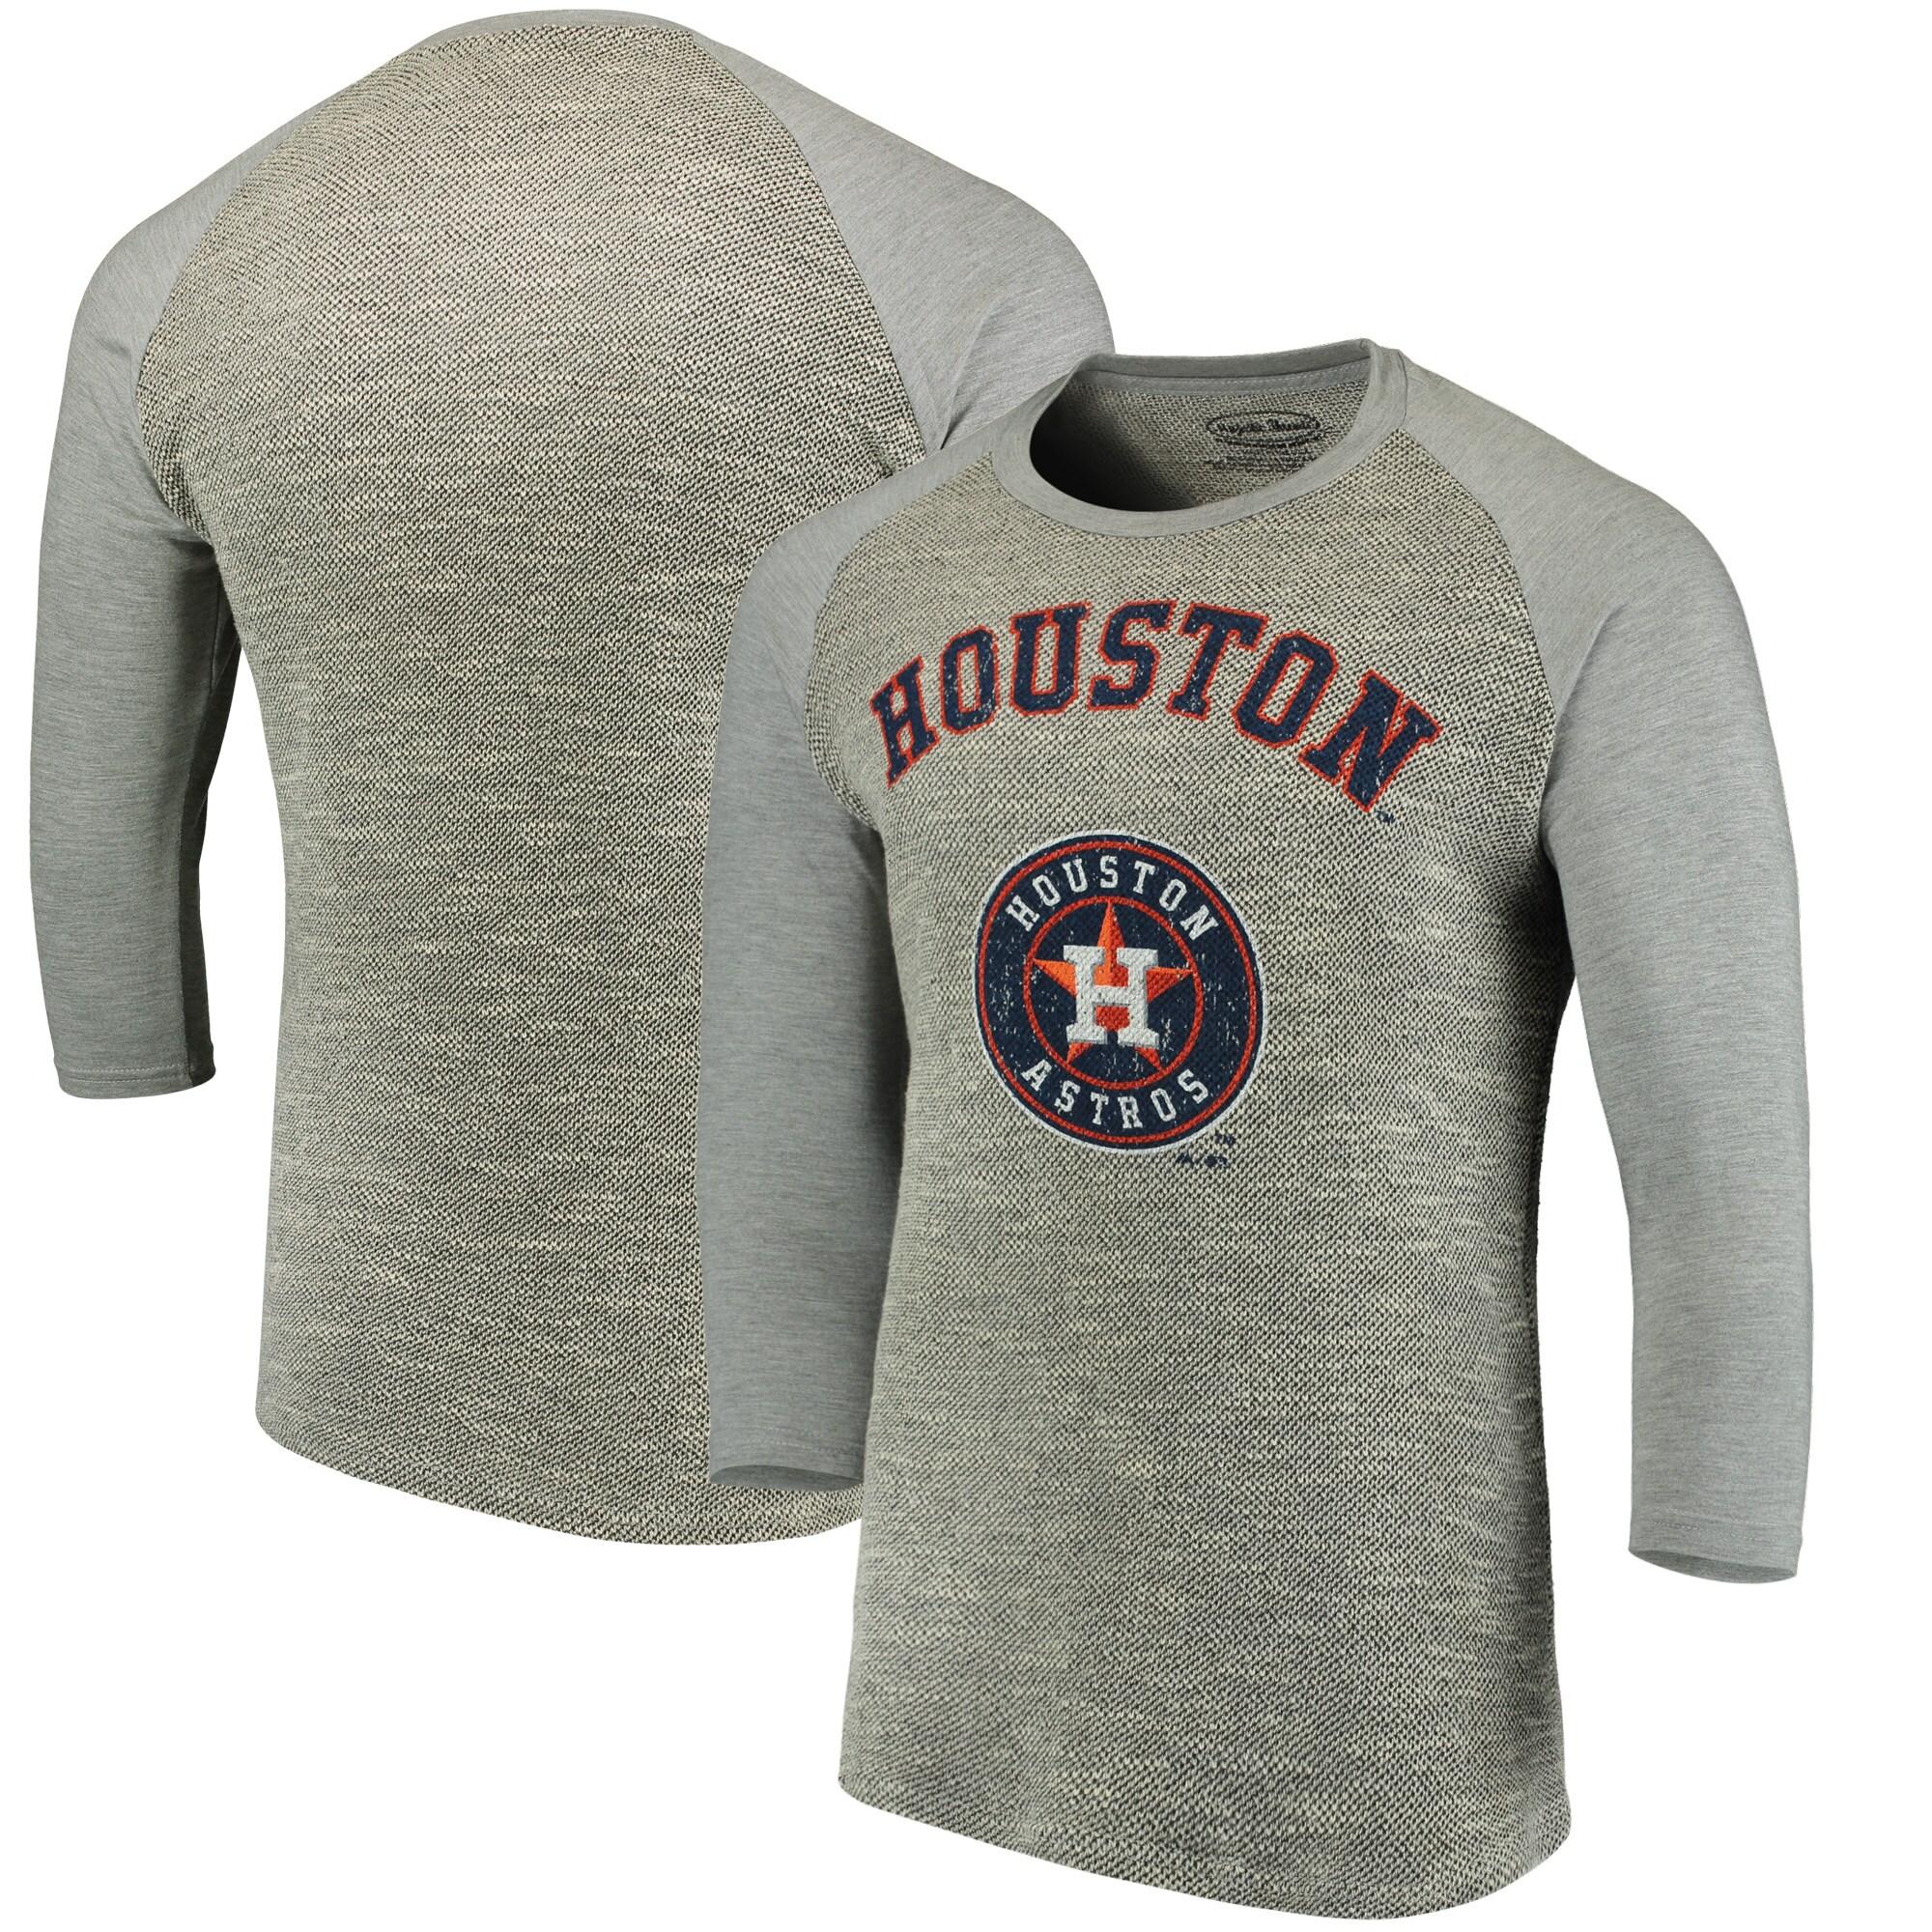 Houston Astros Majestic Threads Tri-Yarn French Terry 3/4-Sleeve Raglan T-Shirt - Gray